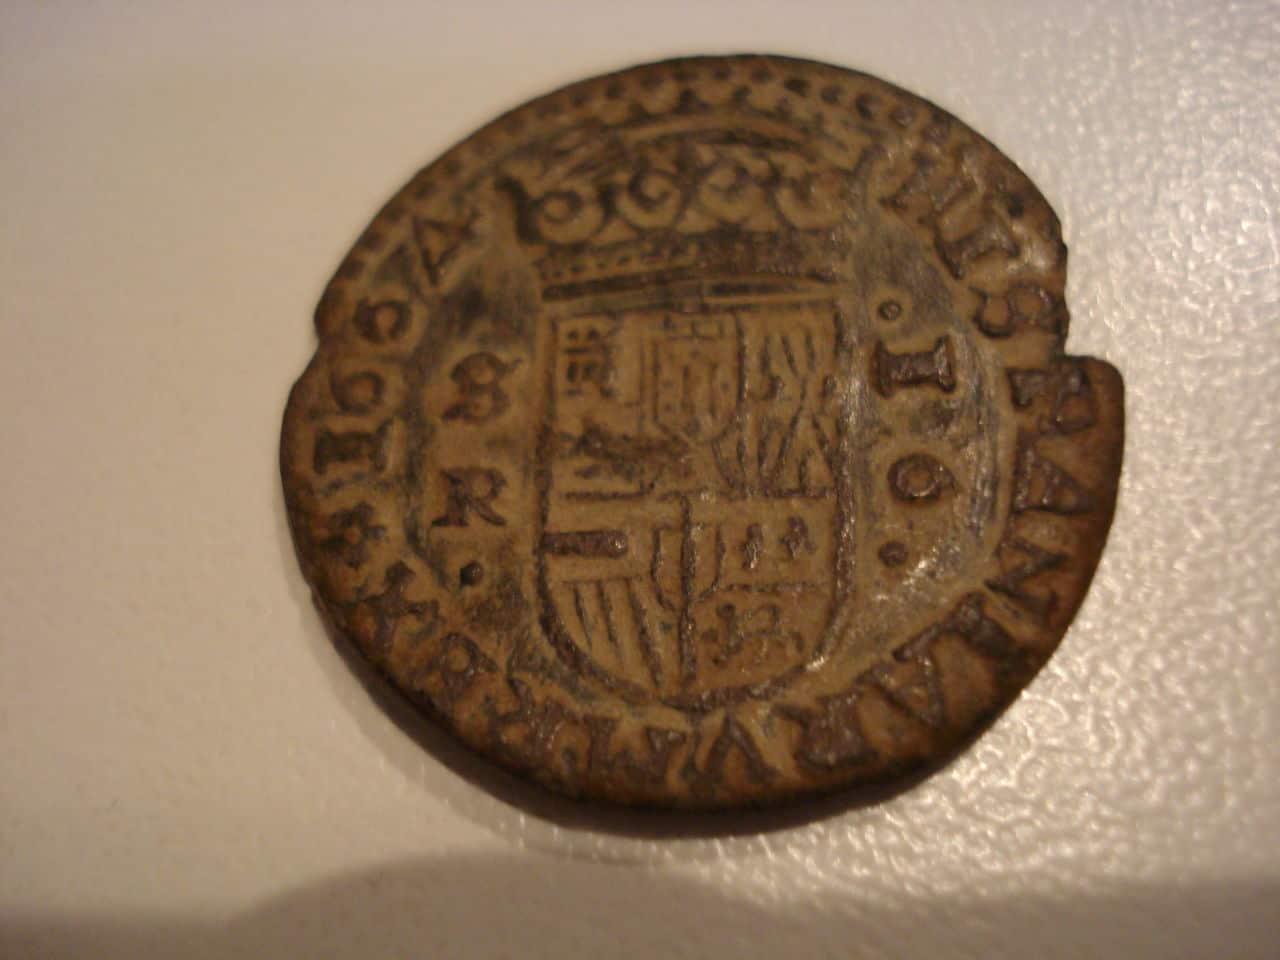 16 maravedís 1664. Felipe IV, ceca Sevilla, variante Philipp. Phillip_010